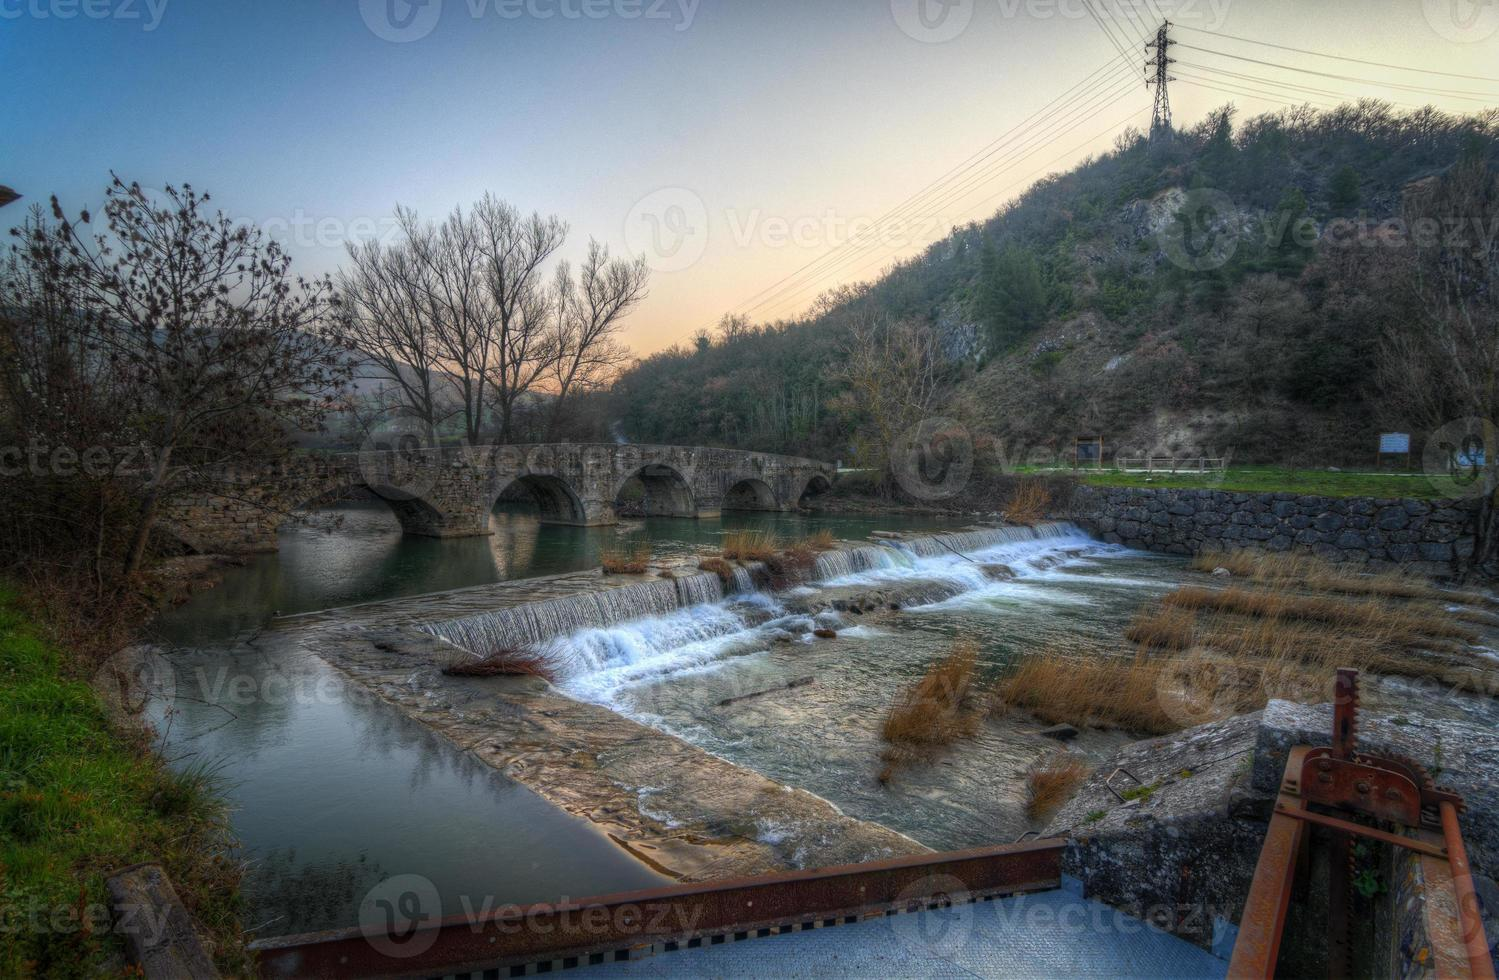 arre bridge i gryningen. foto